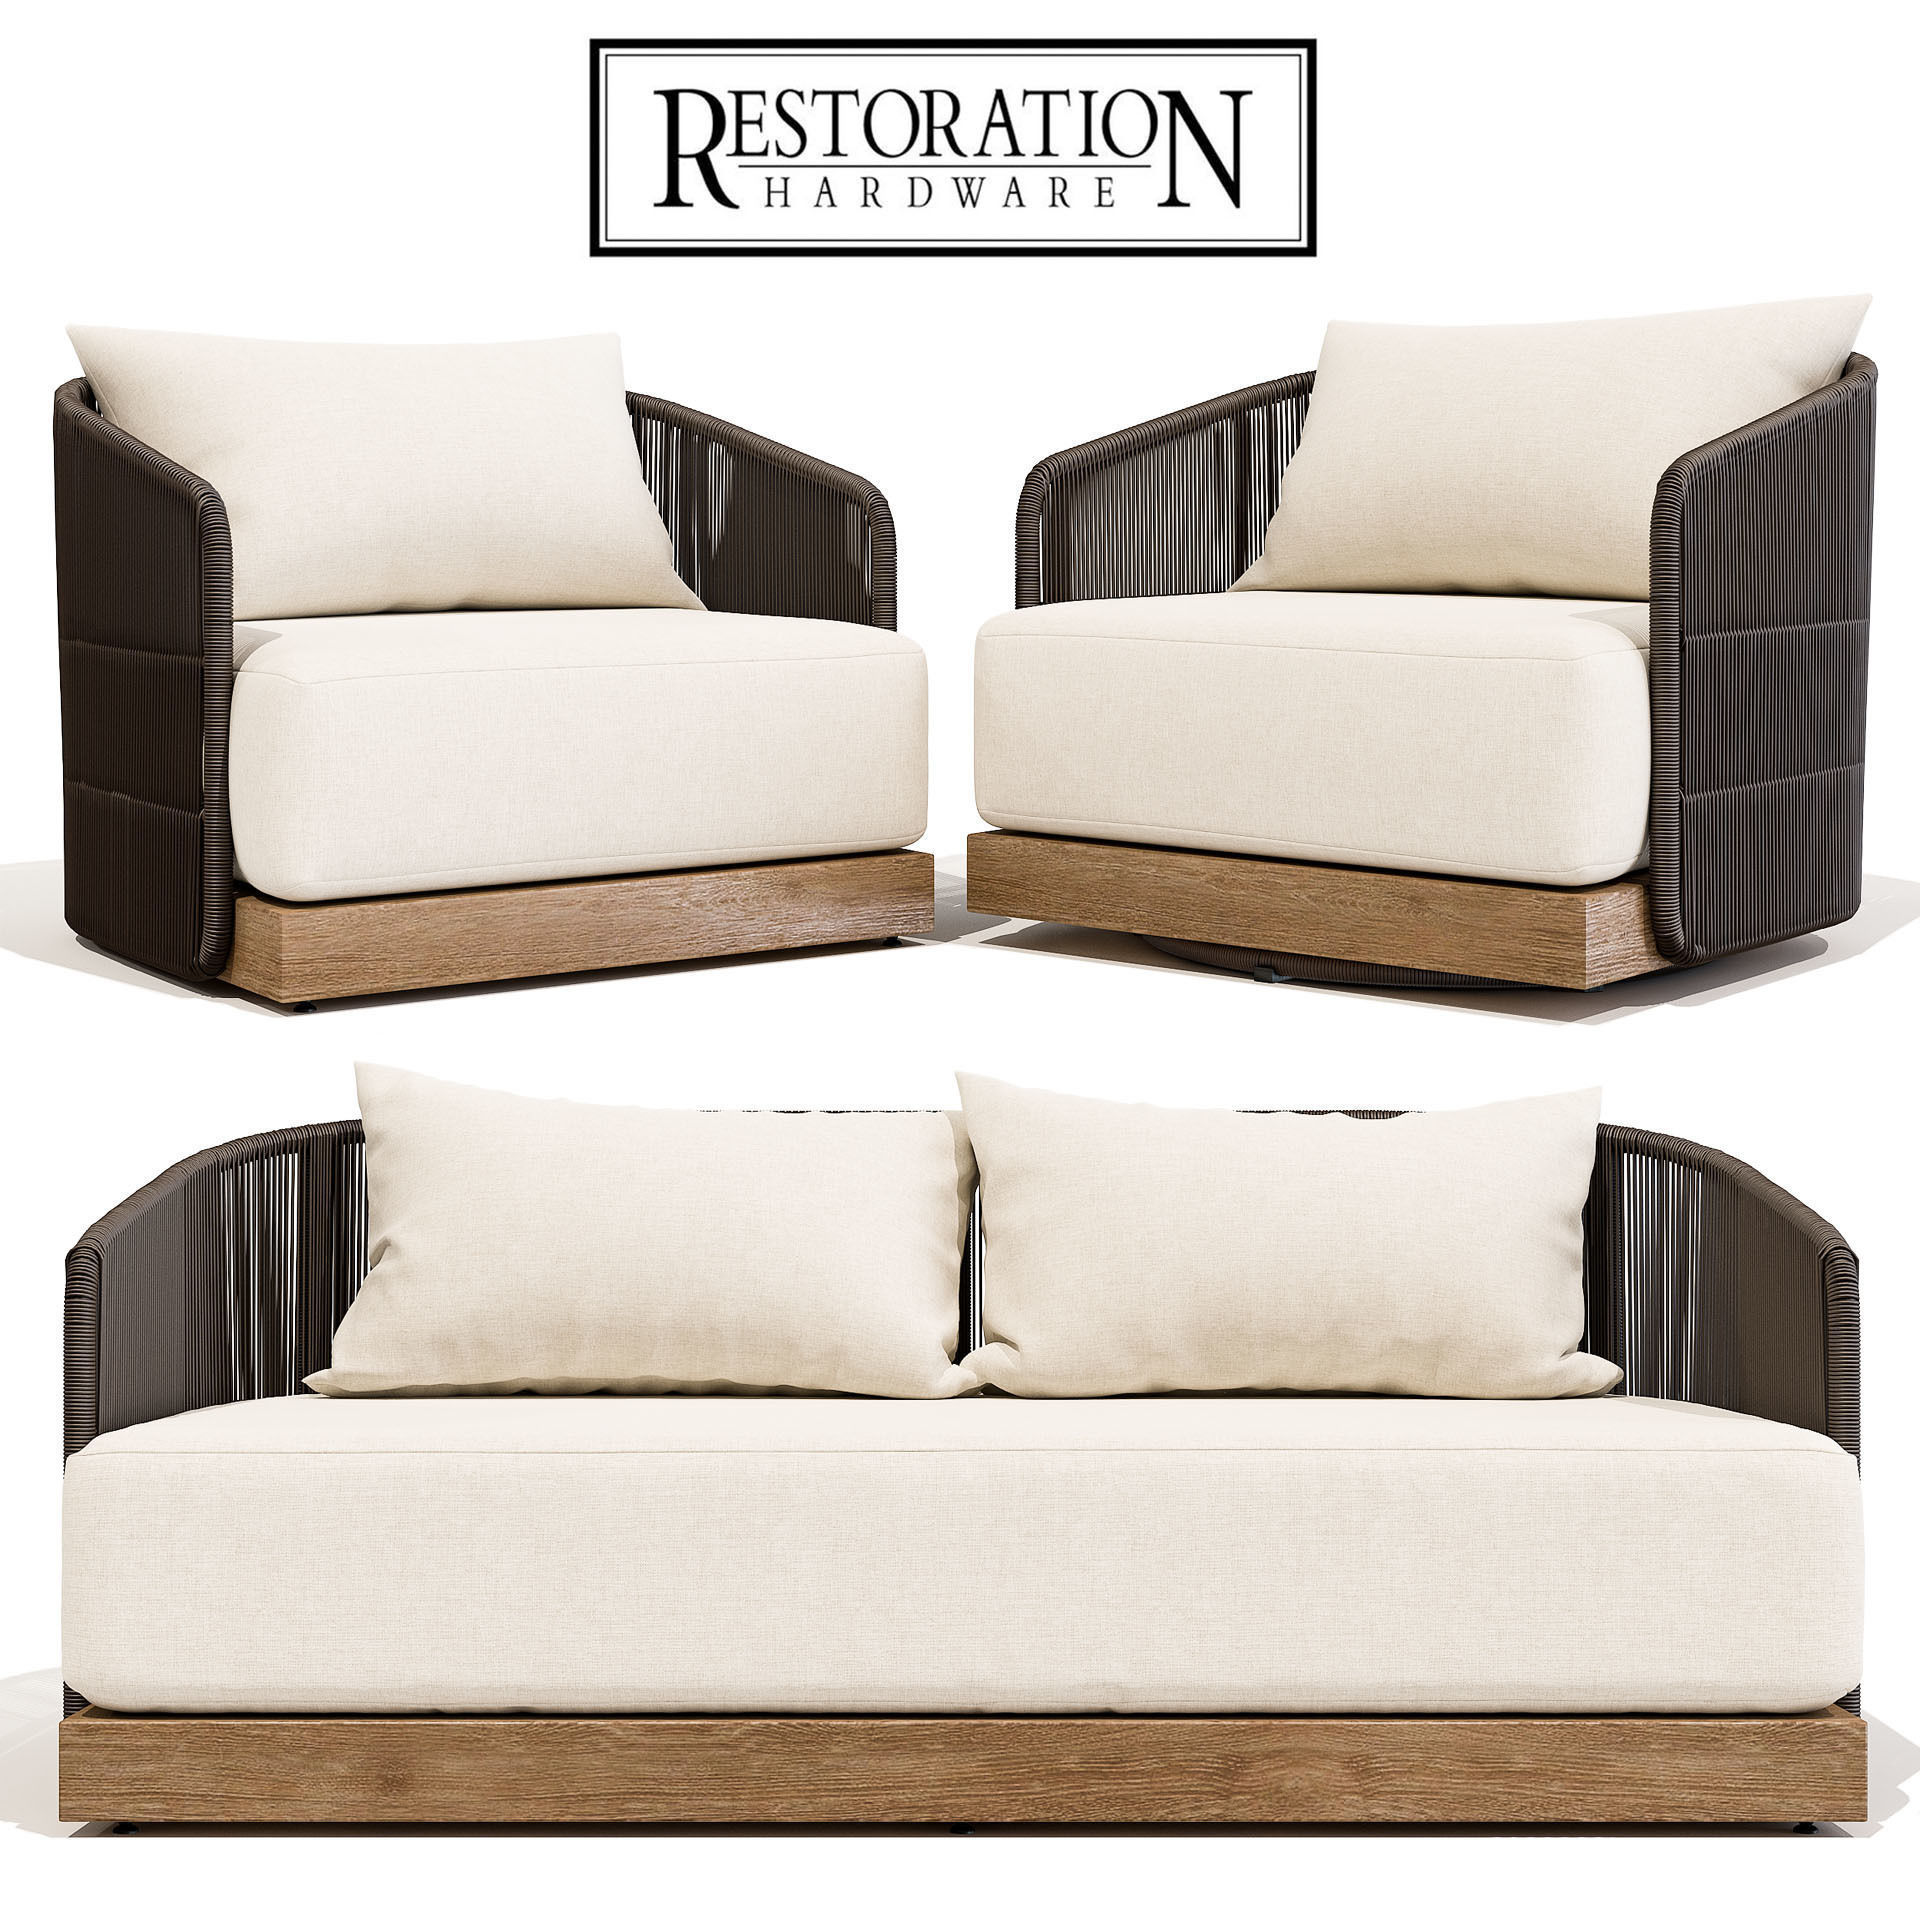 Restoration Hardware Havana Sofa 68 With Lounge And Swivel Chair Model Max Obj Mtl 1